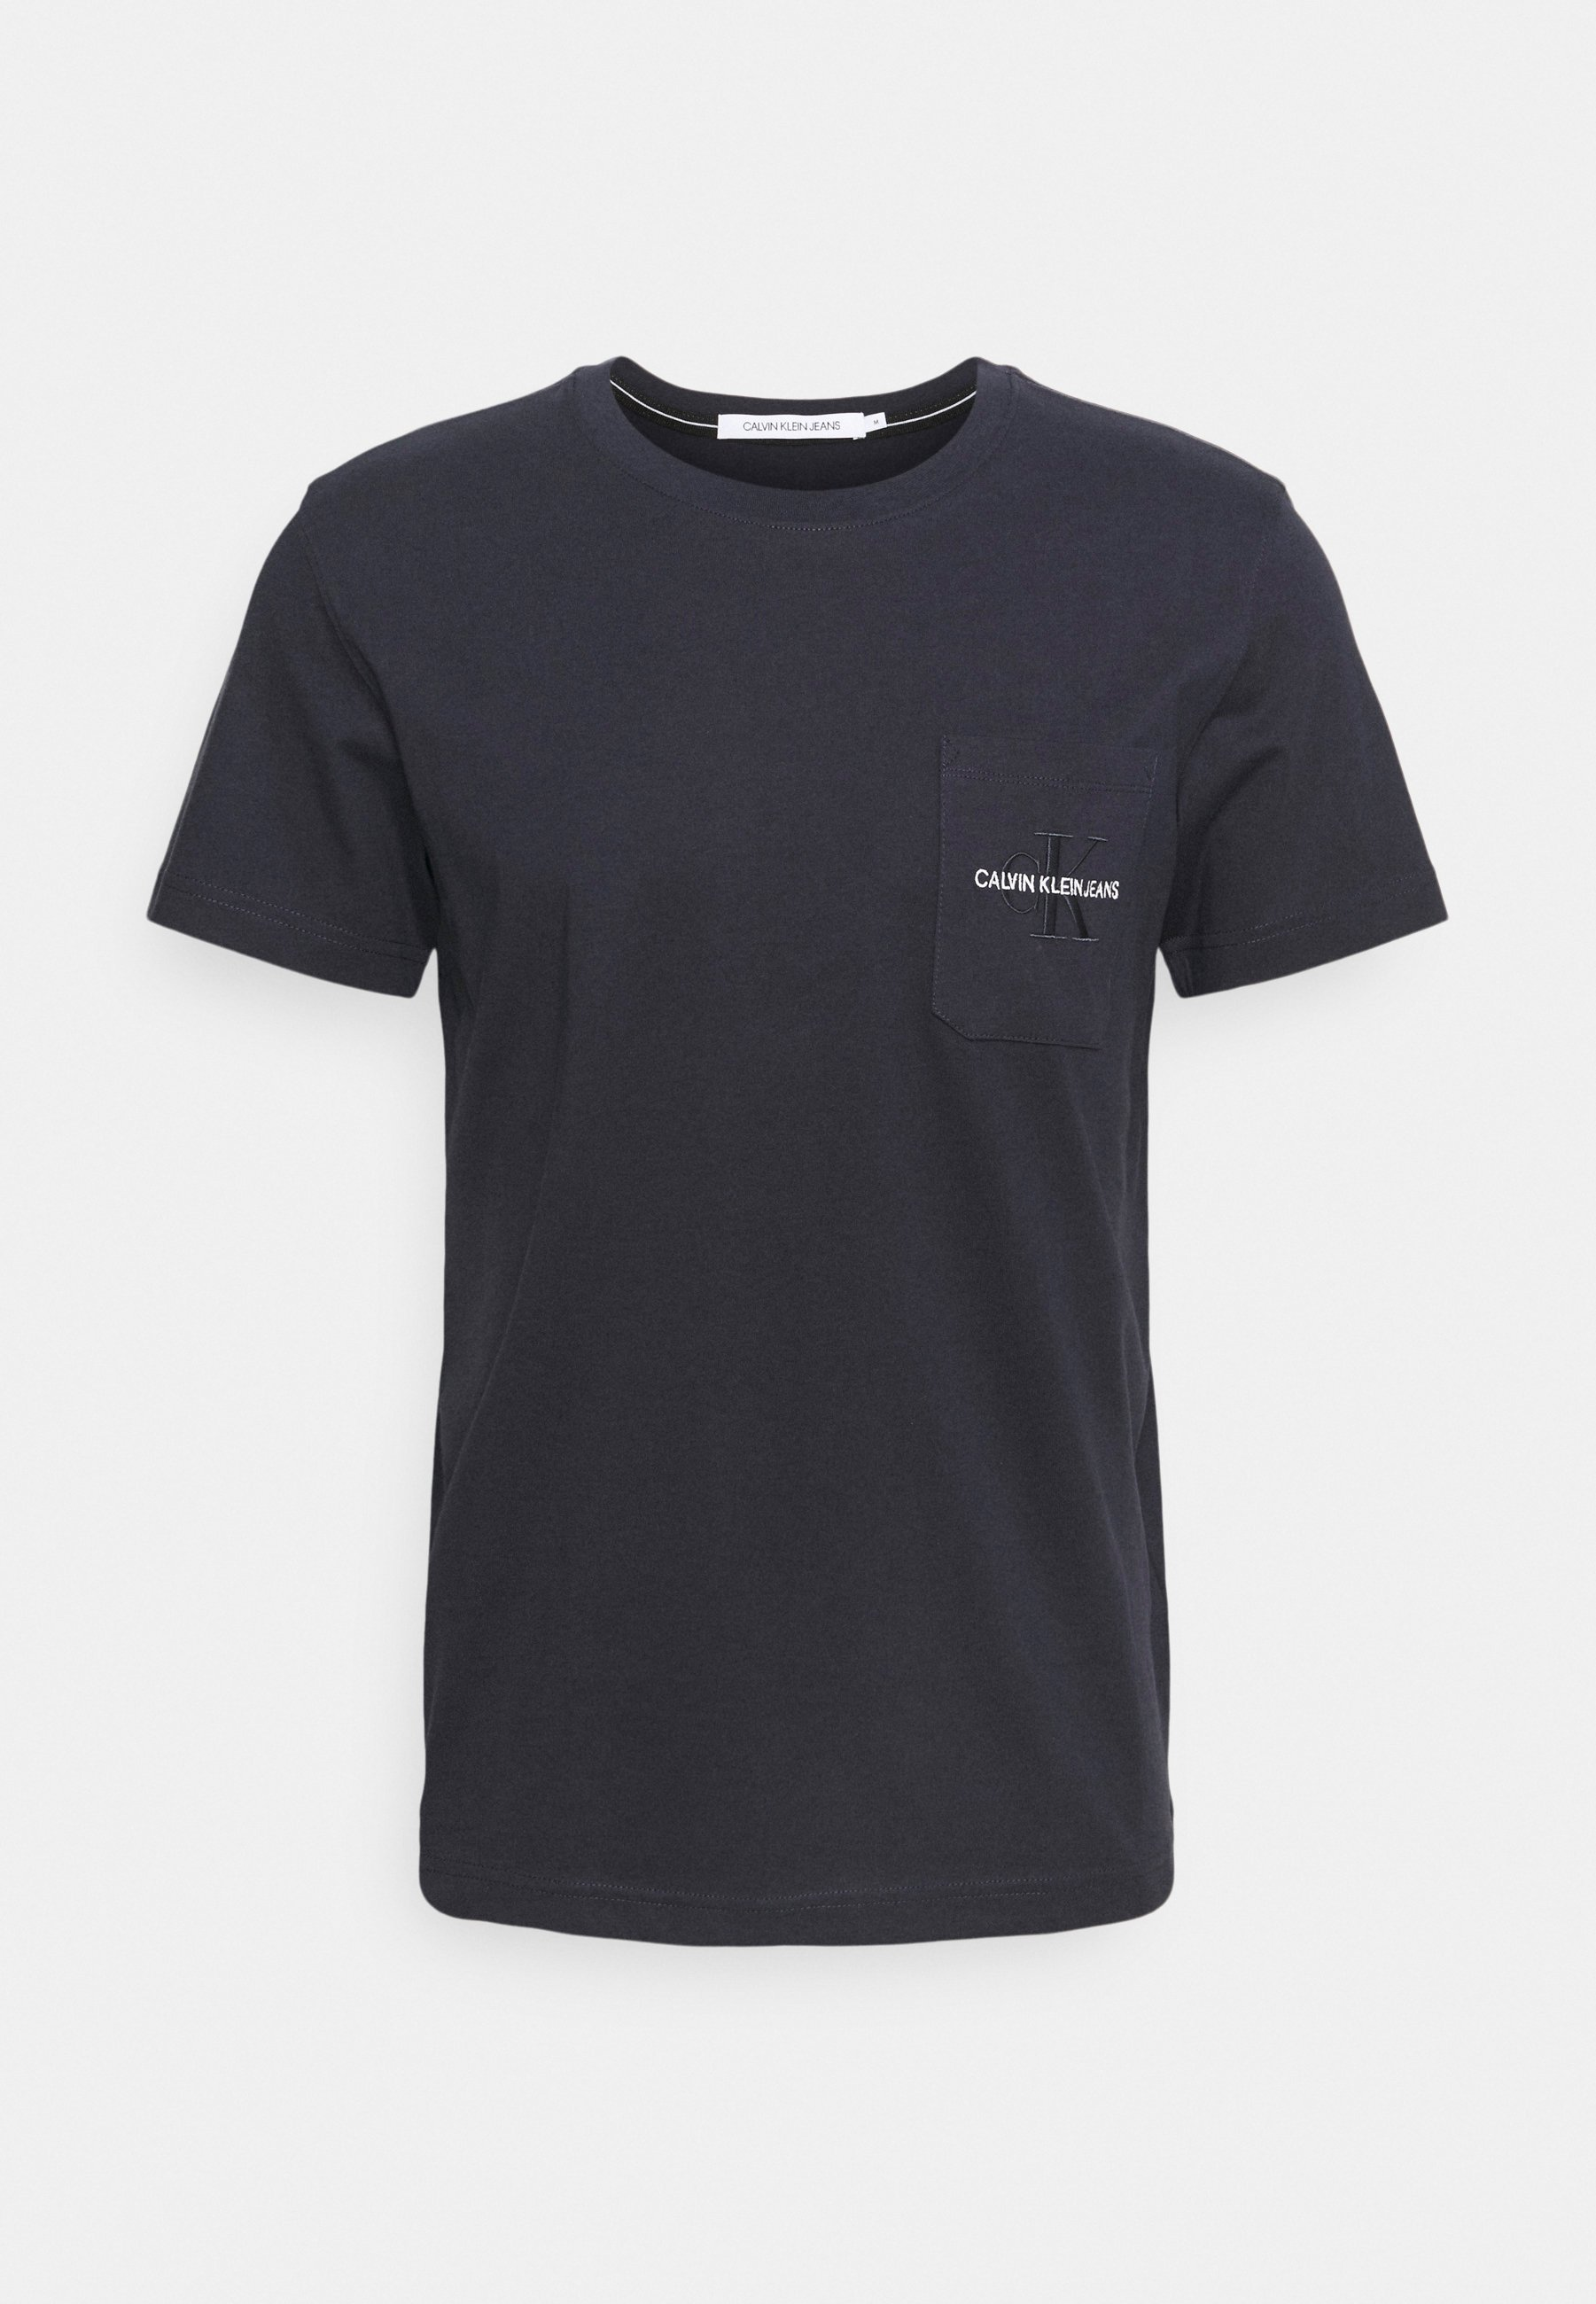 Homme MONOGRAM EMBROIDERY POCKET TEE - T-shirt imprimé